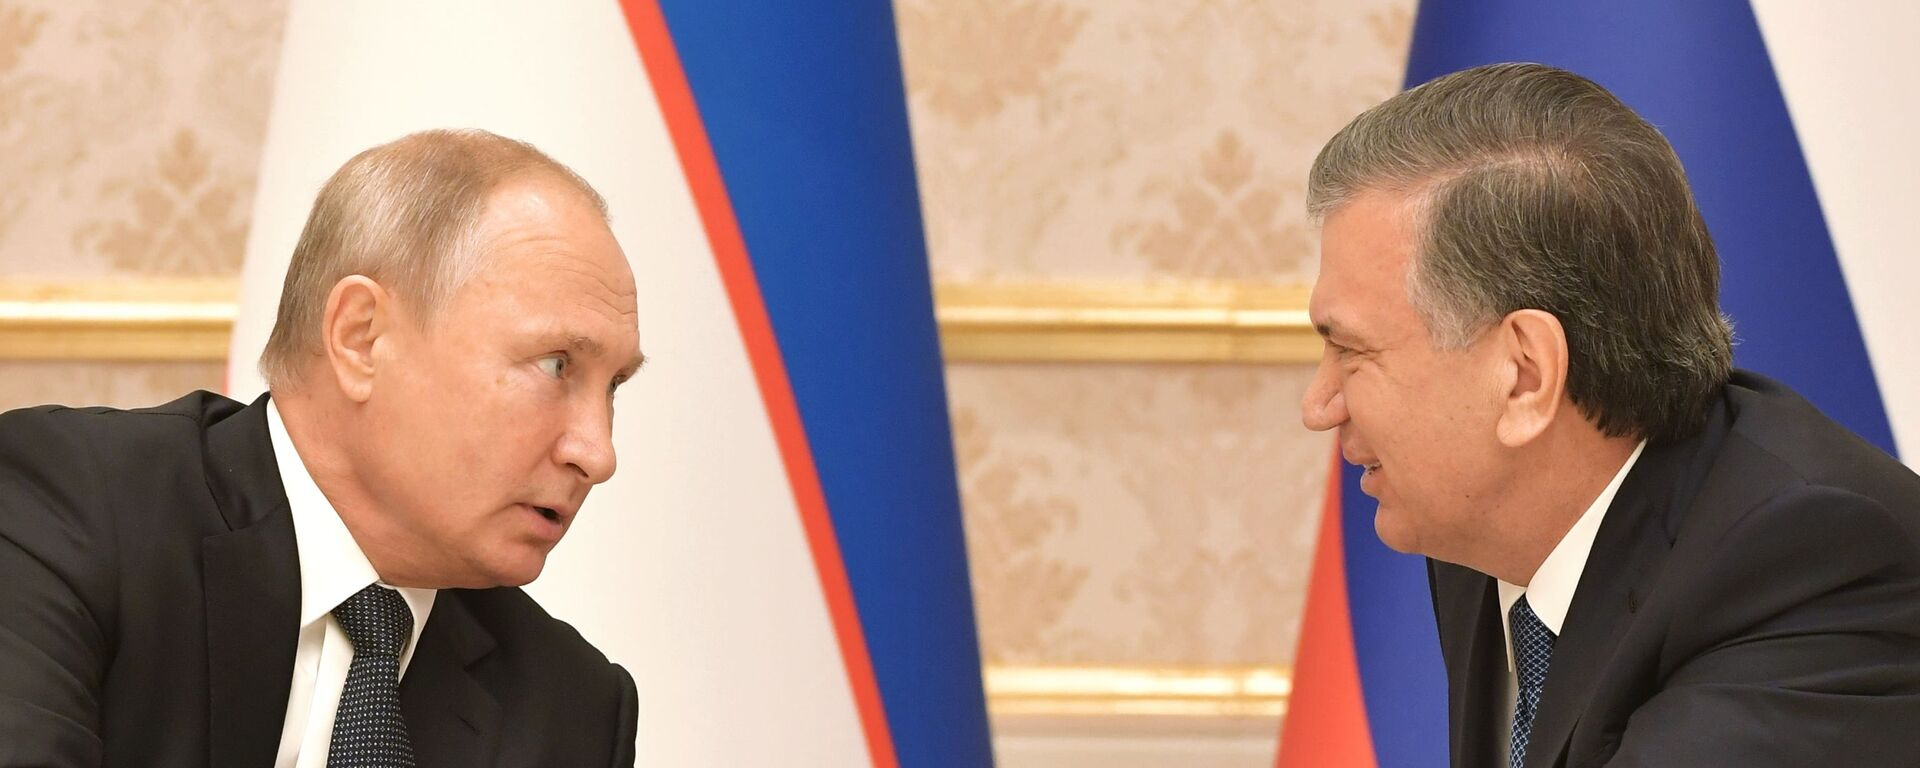 Государственный визит президента РФ Владимира Путина в Узбекистан - Sputnik Таджикистан, 1920, 07.05.2021